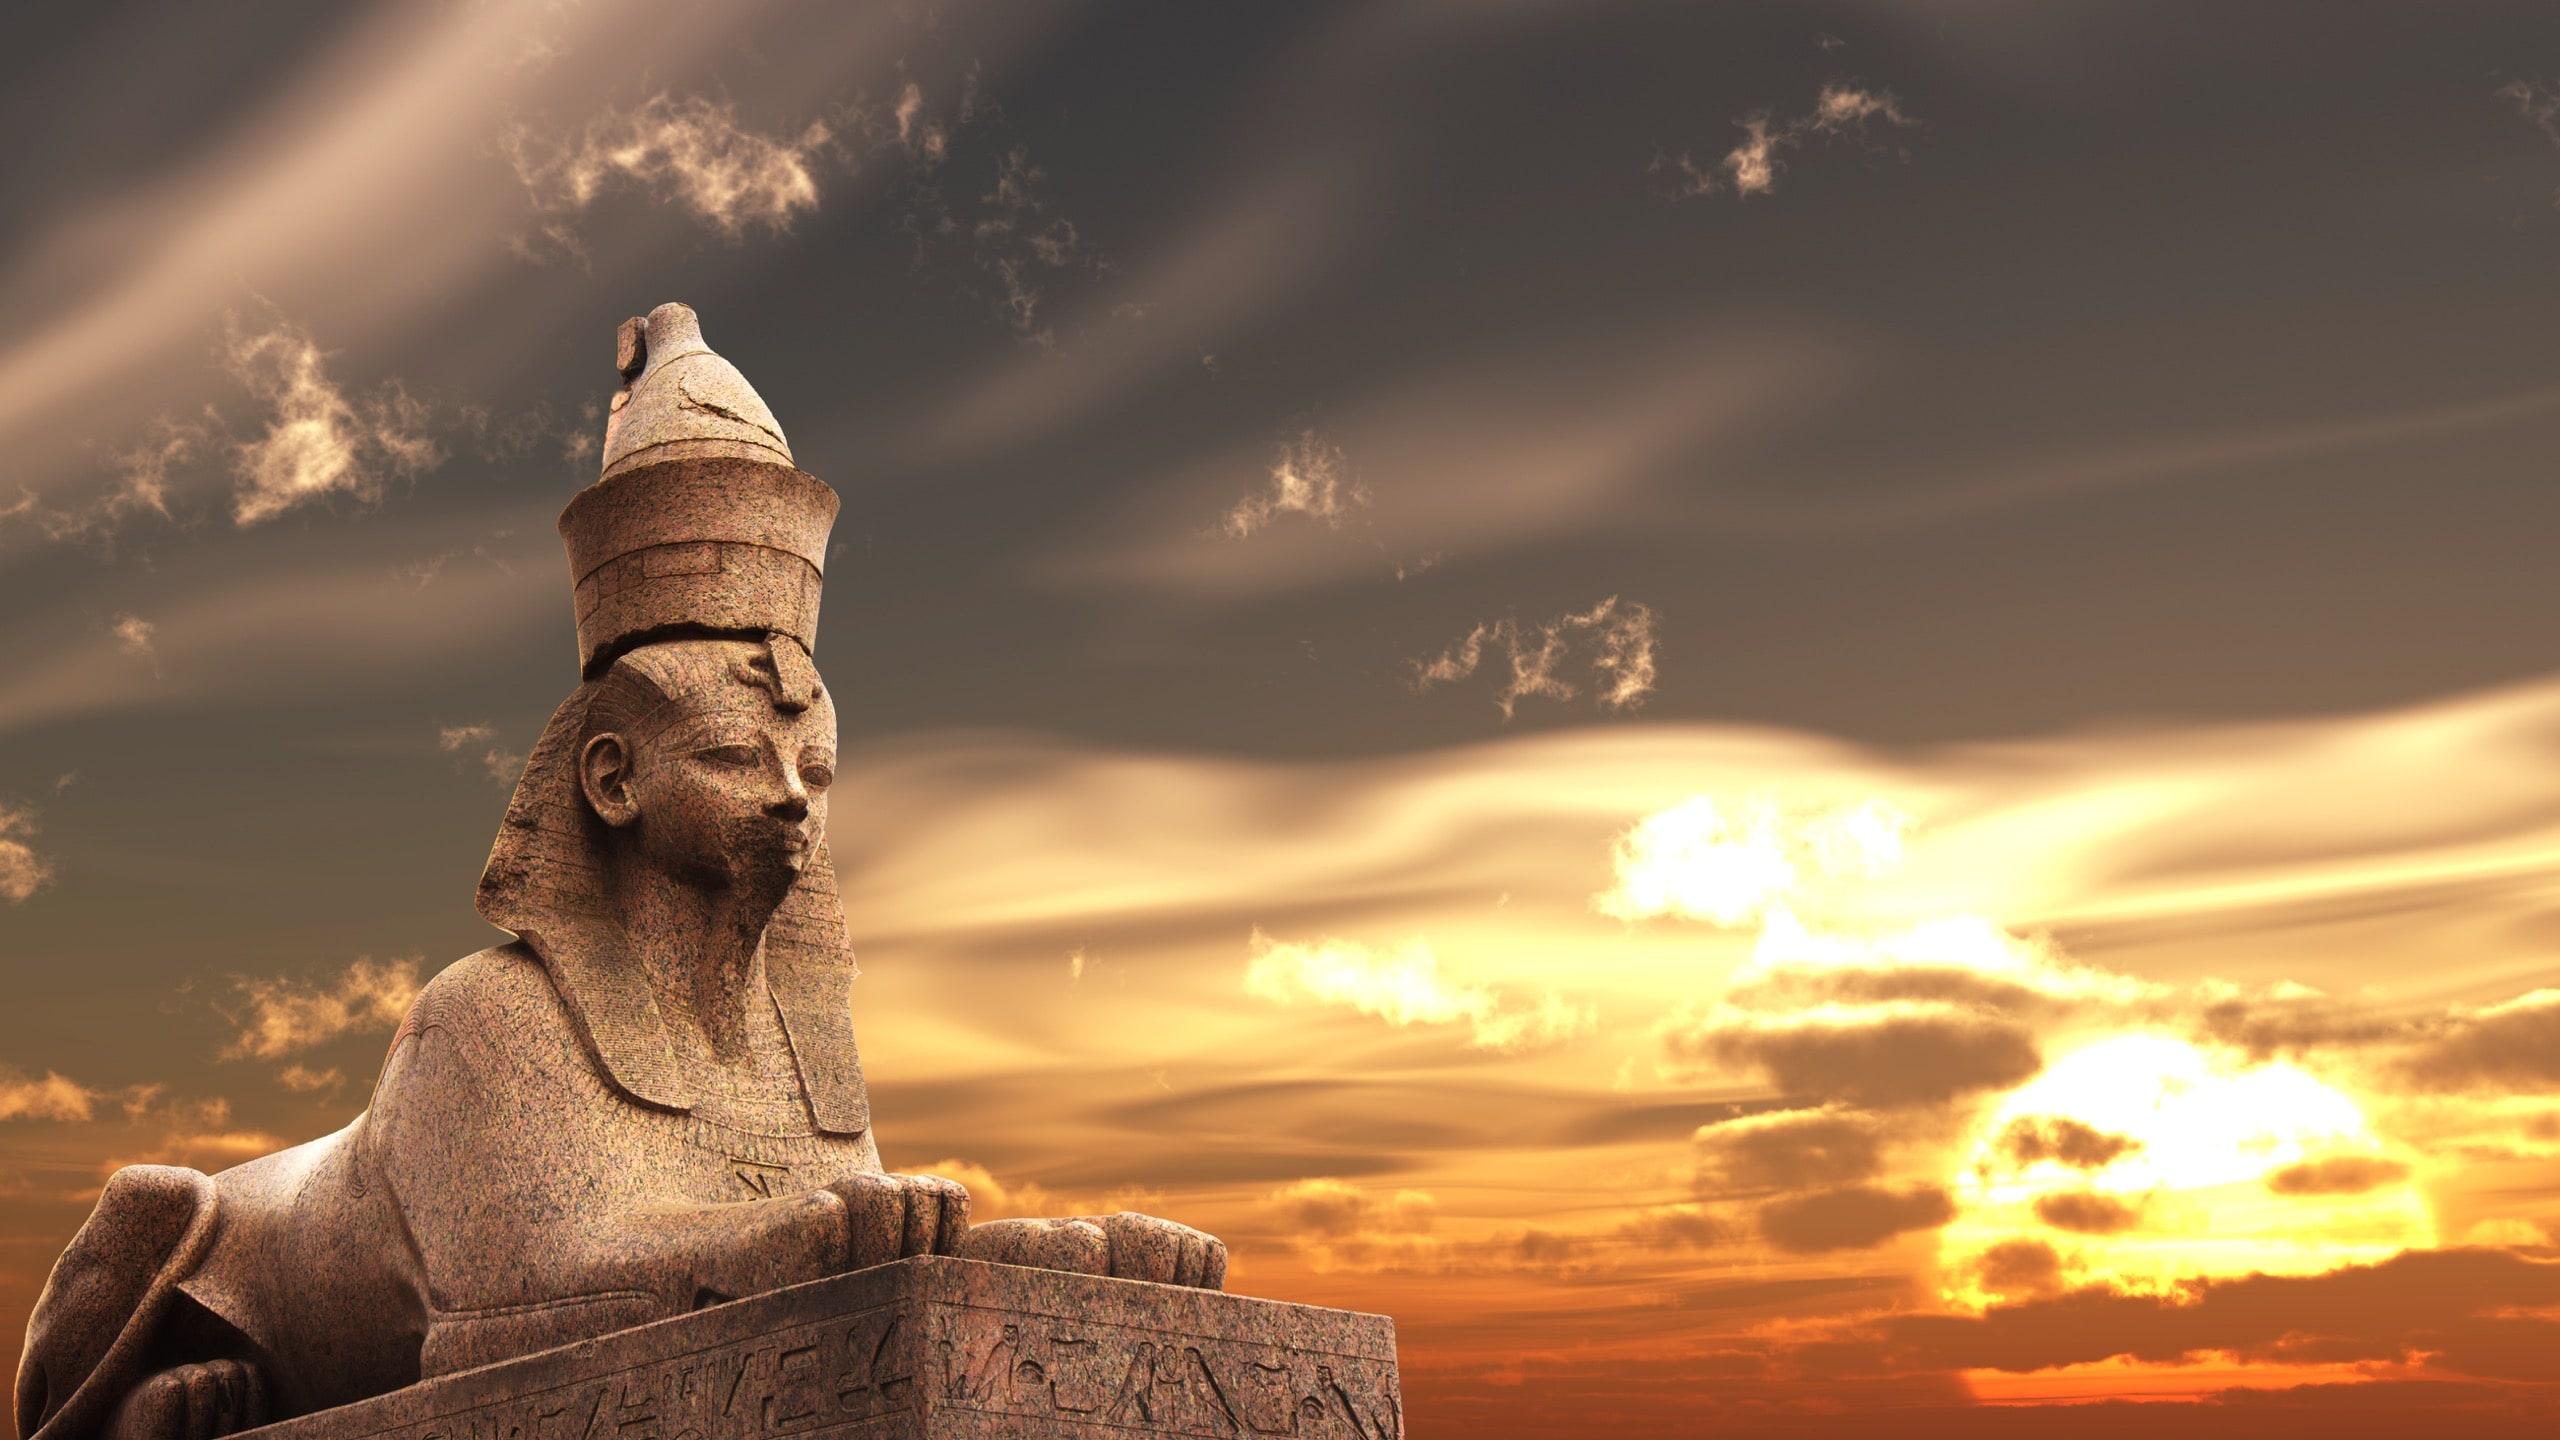 Egyptian Sphinx on sunset sky background